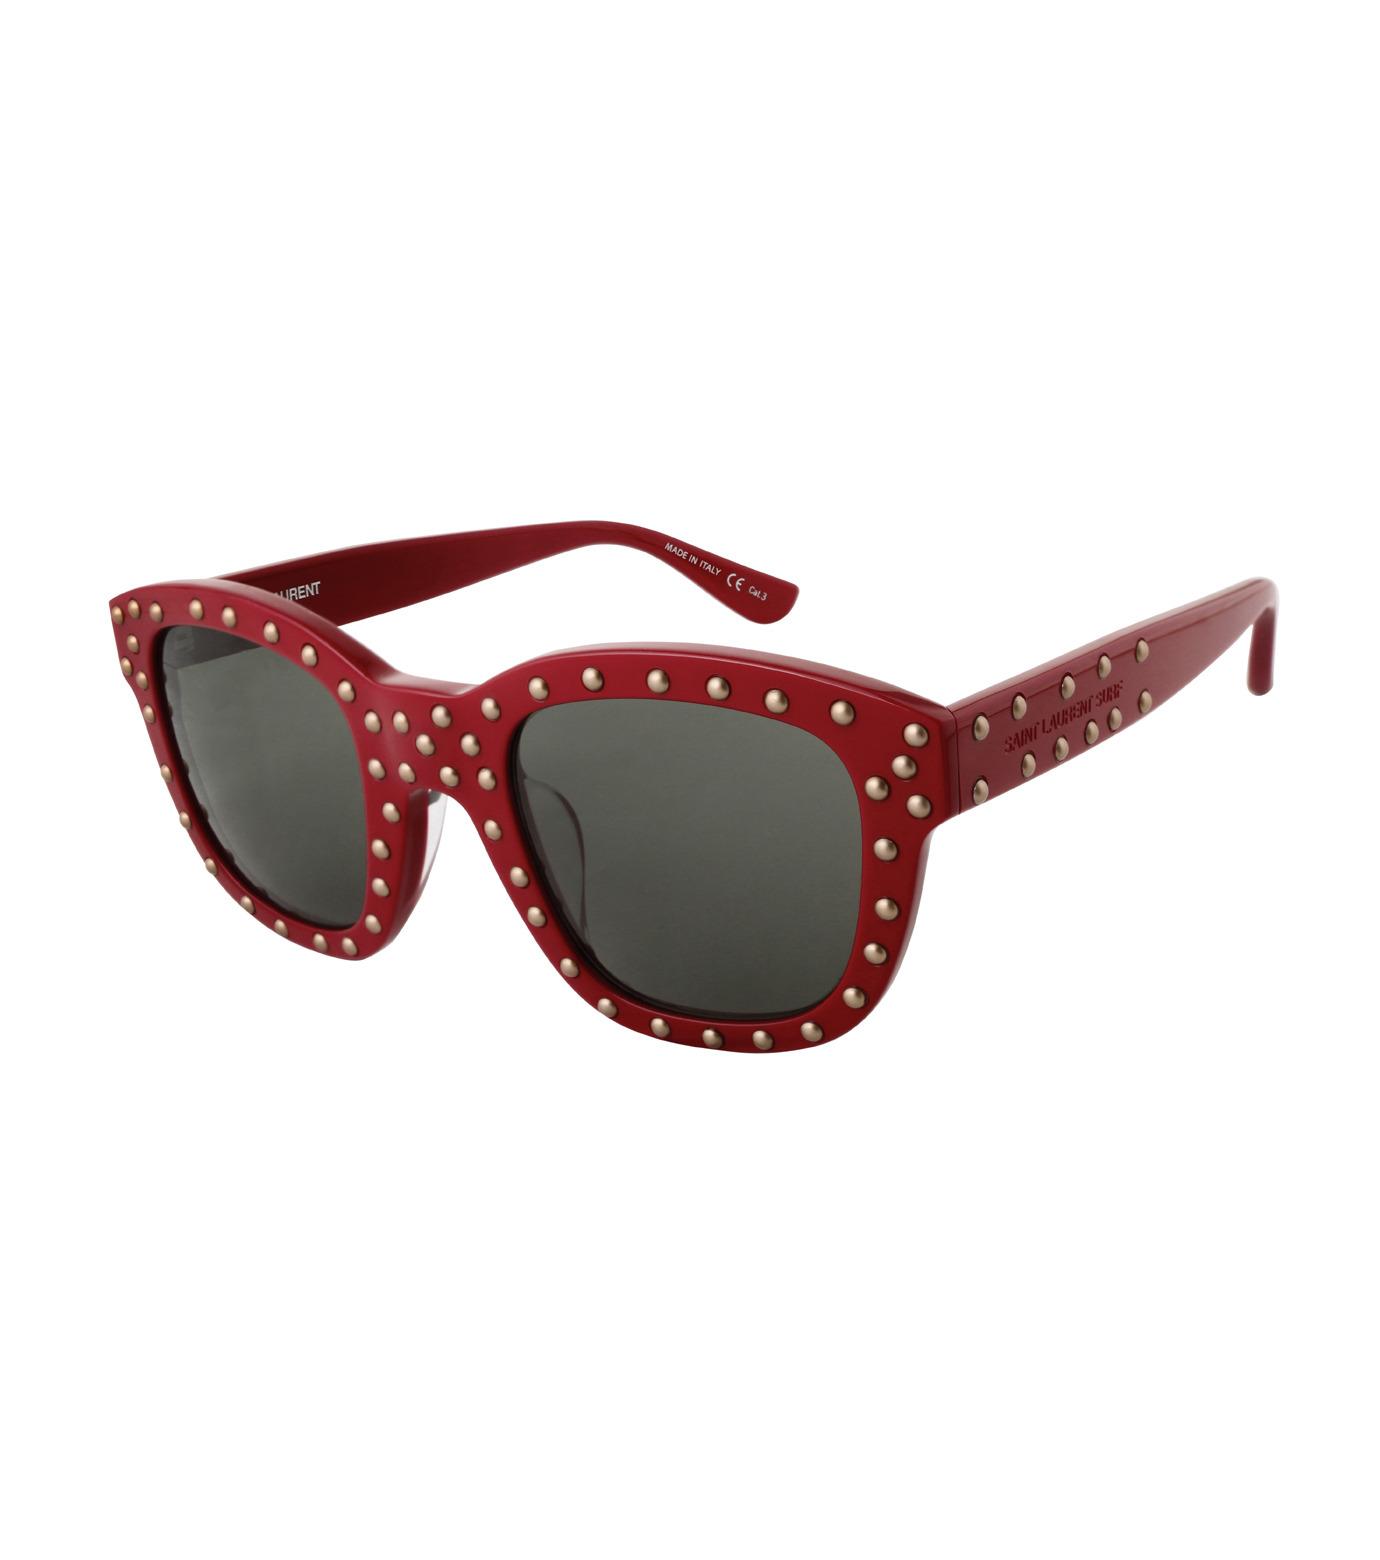 SAINT LAURENT(サンローラン)のSL 100 Lou Studded-RED(アイウェア/eyewear)-420137-62 拡大詳細画像1